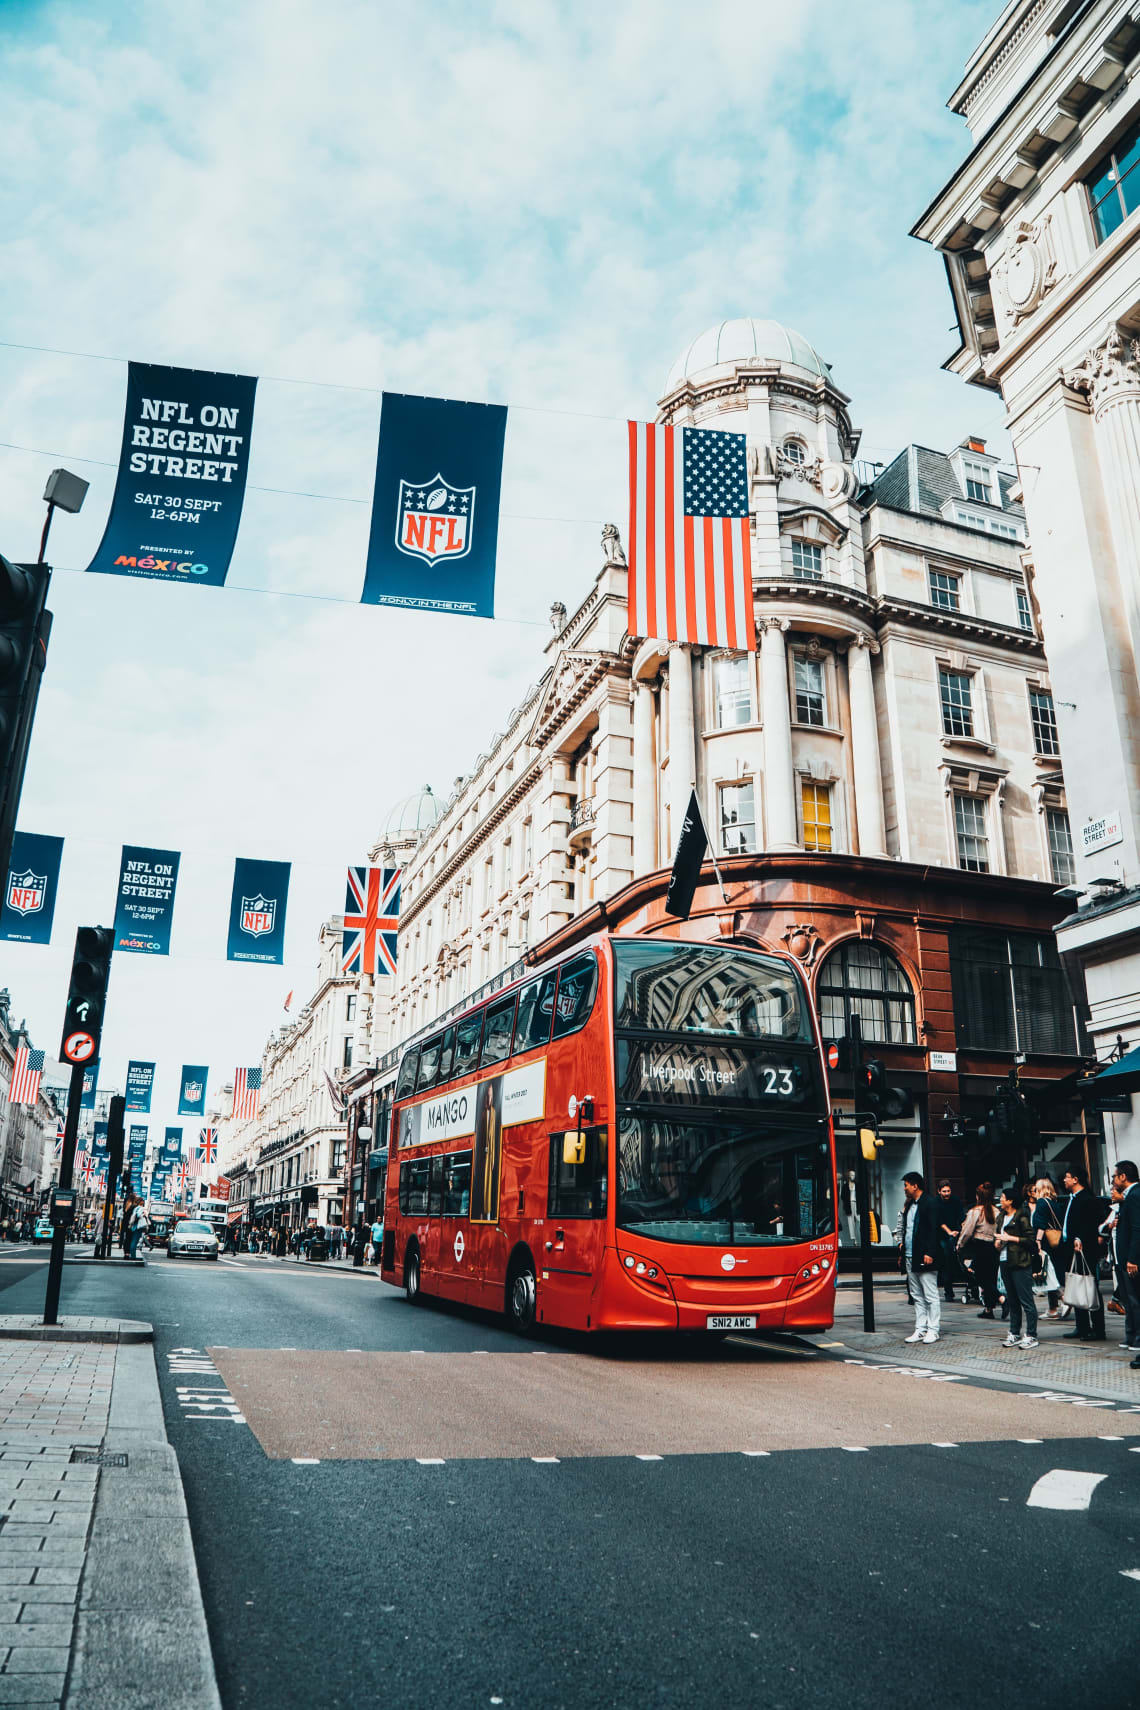 Public bus in London, England